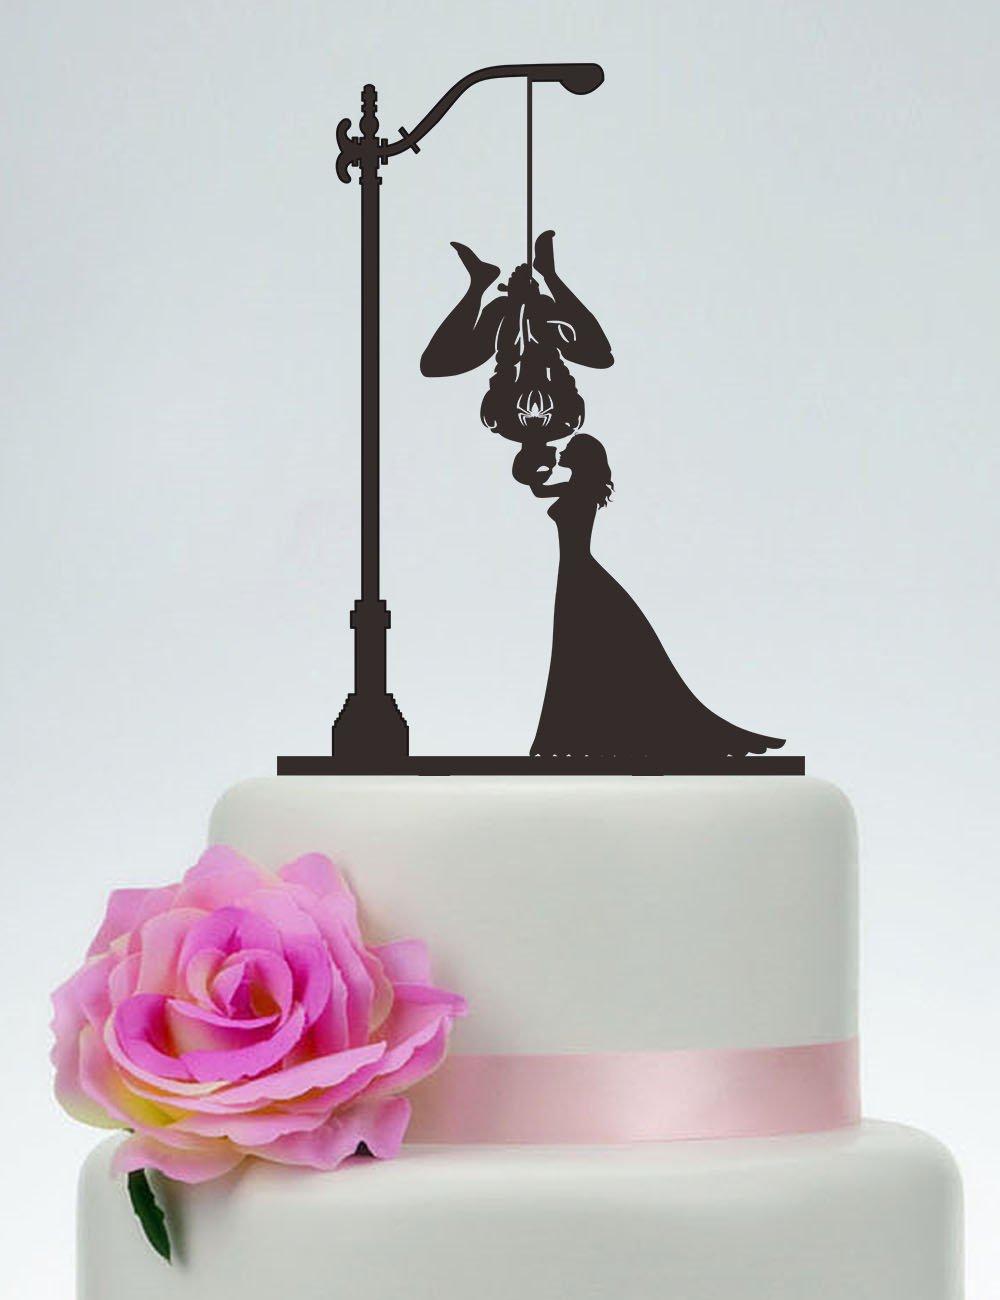 Spider-Man Cake Topper,Bride And Spider-Man Silhouette,Wedding Cake ...